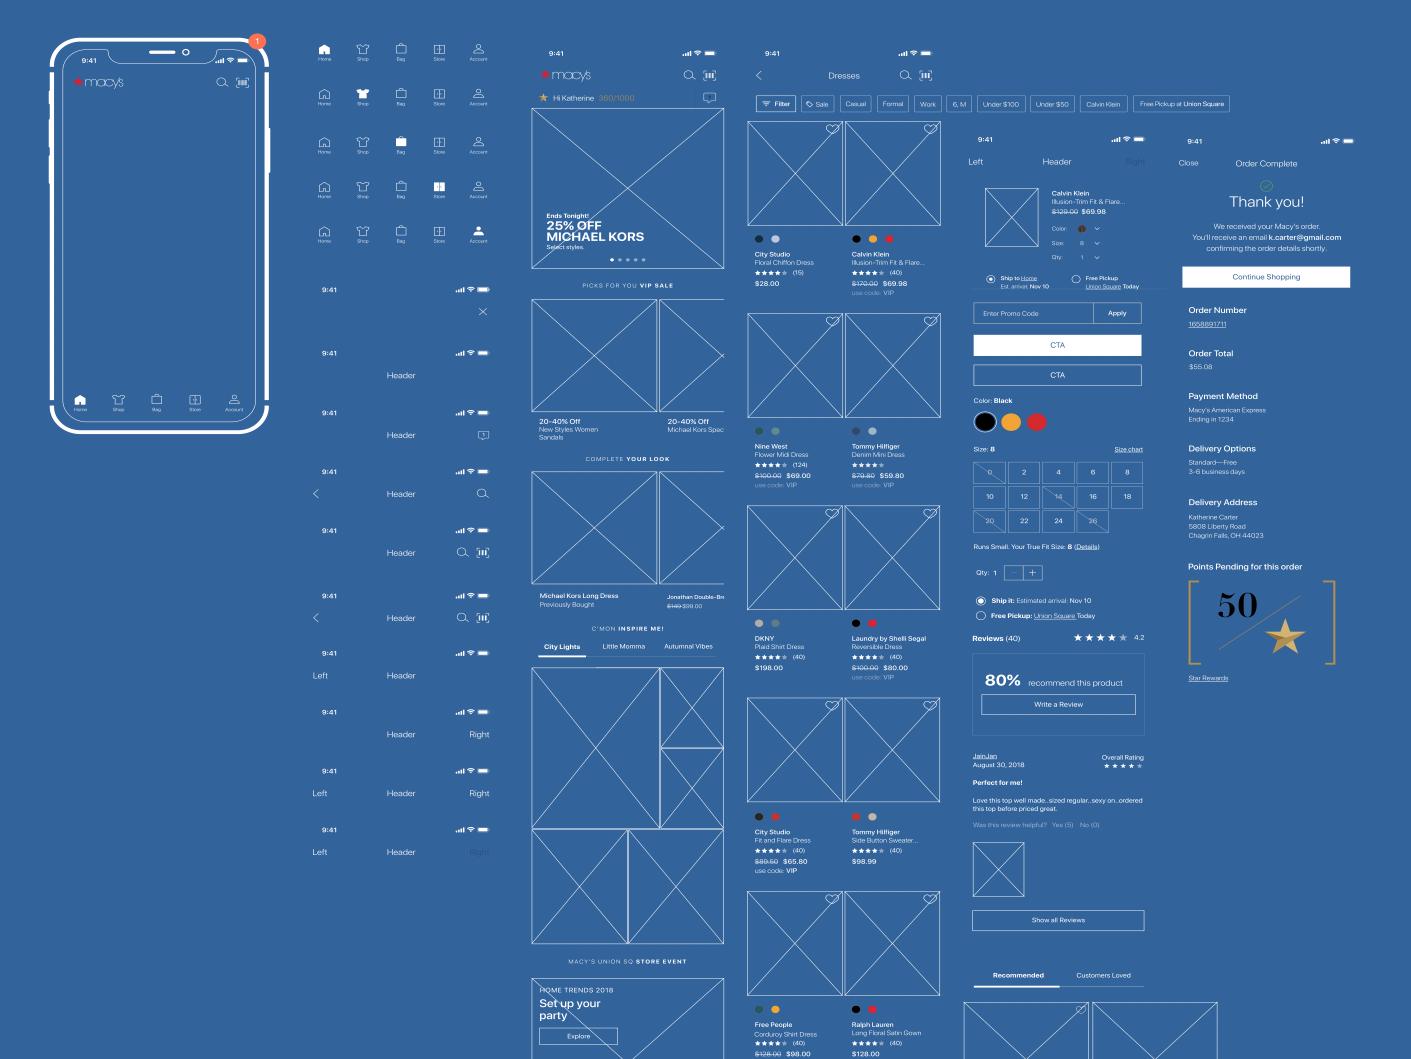 Macy's | Bloomingdales Reference Design UI Kit (iOS) ios design kit wireframe kit wireframe design system ui kit